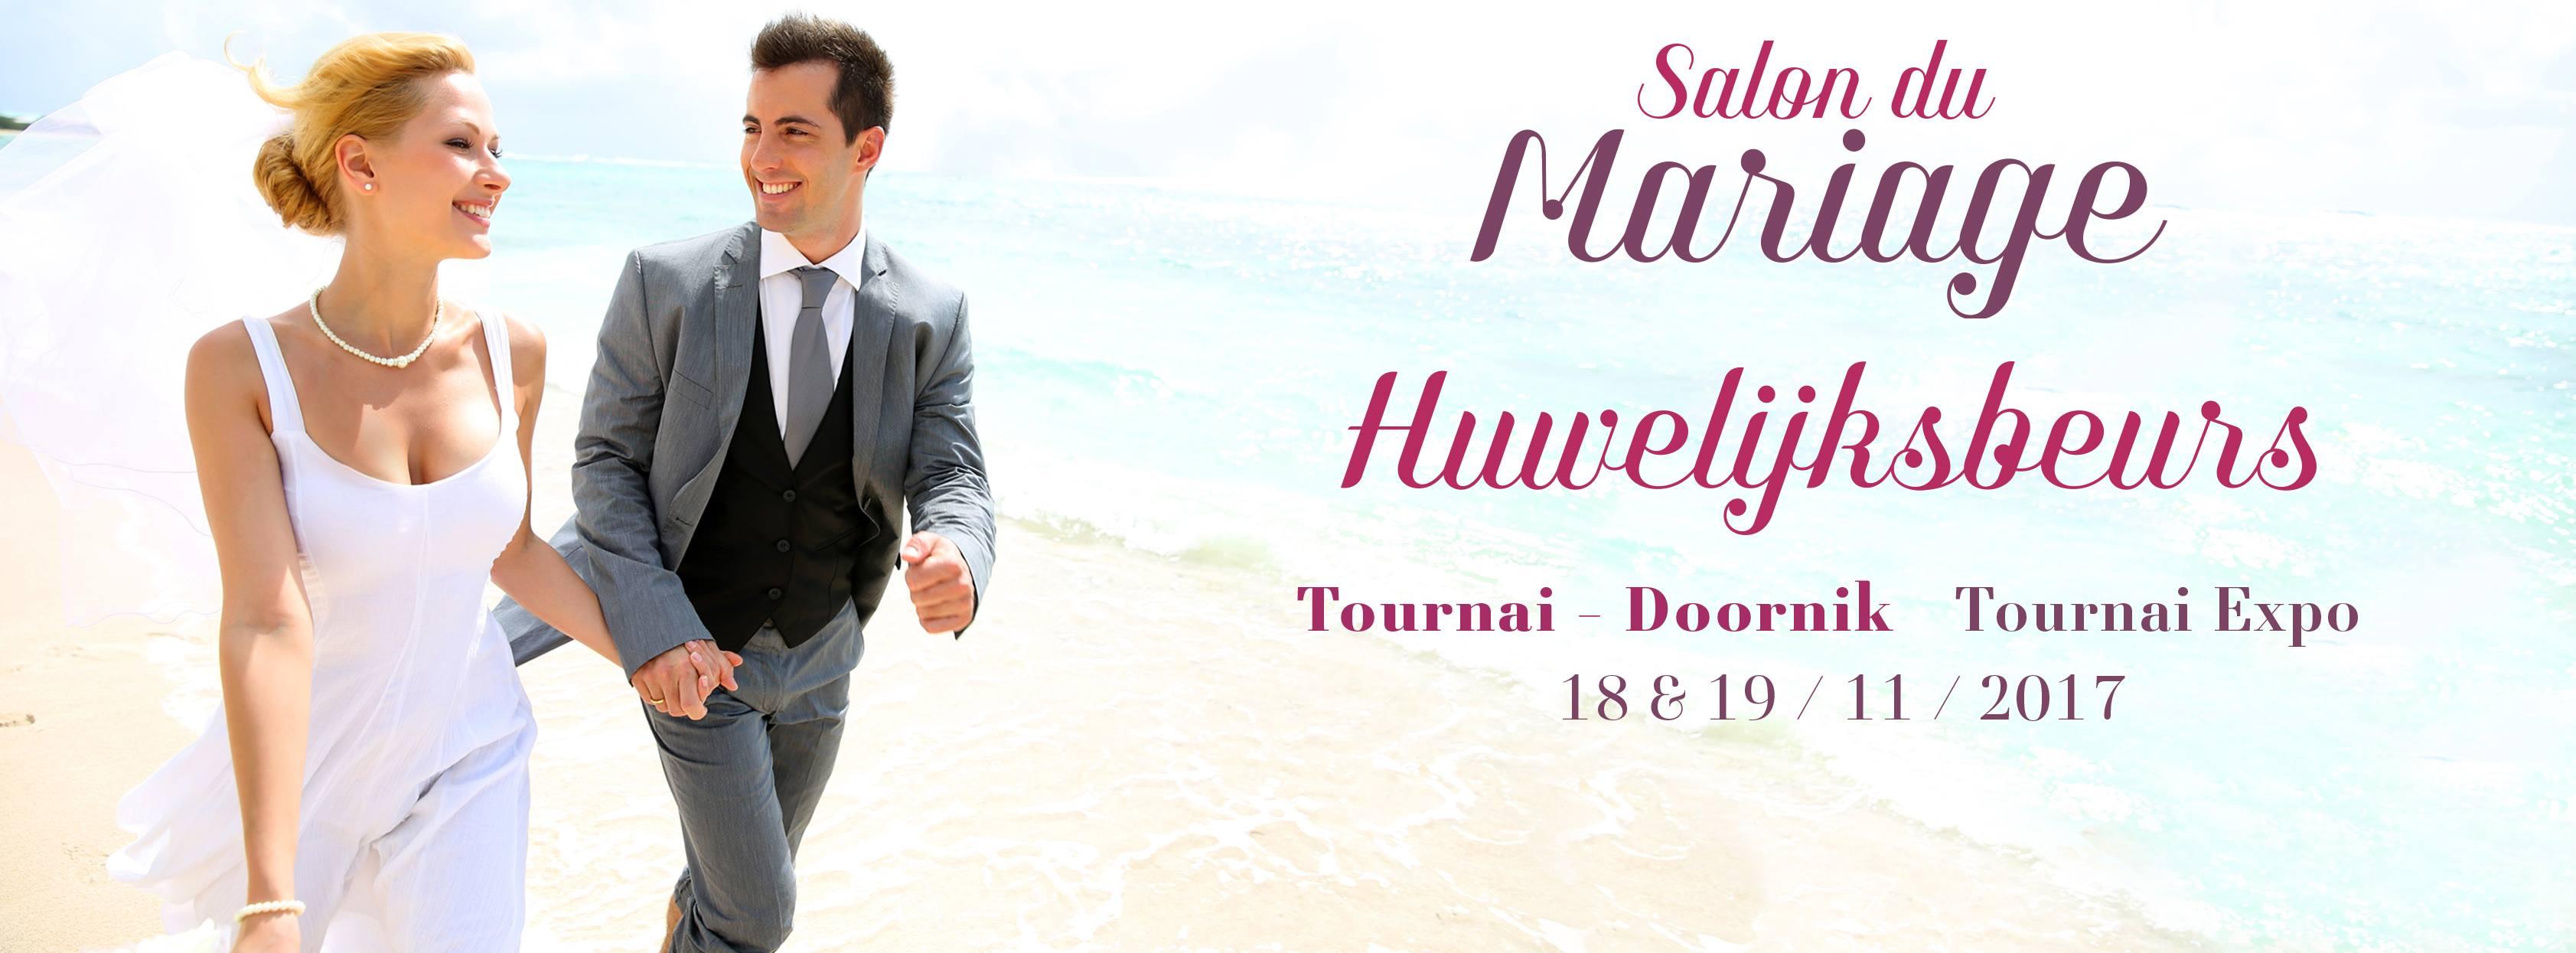 Softlove au Salon du Mariage de Tournai